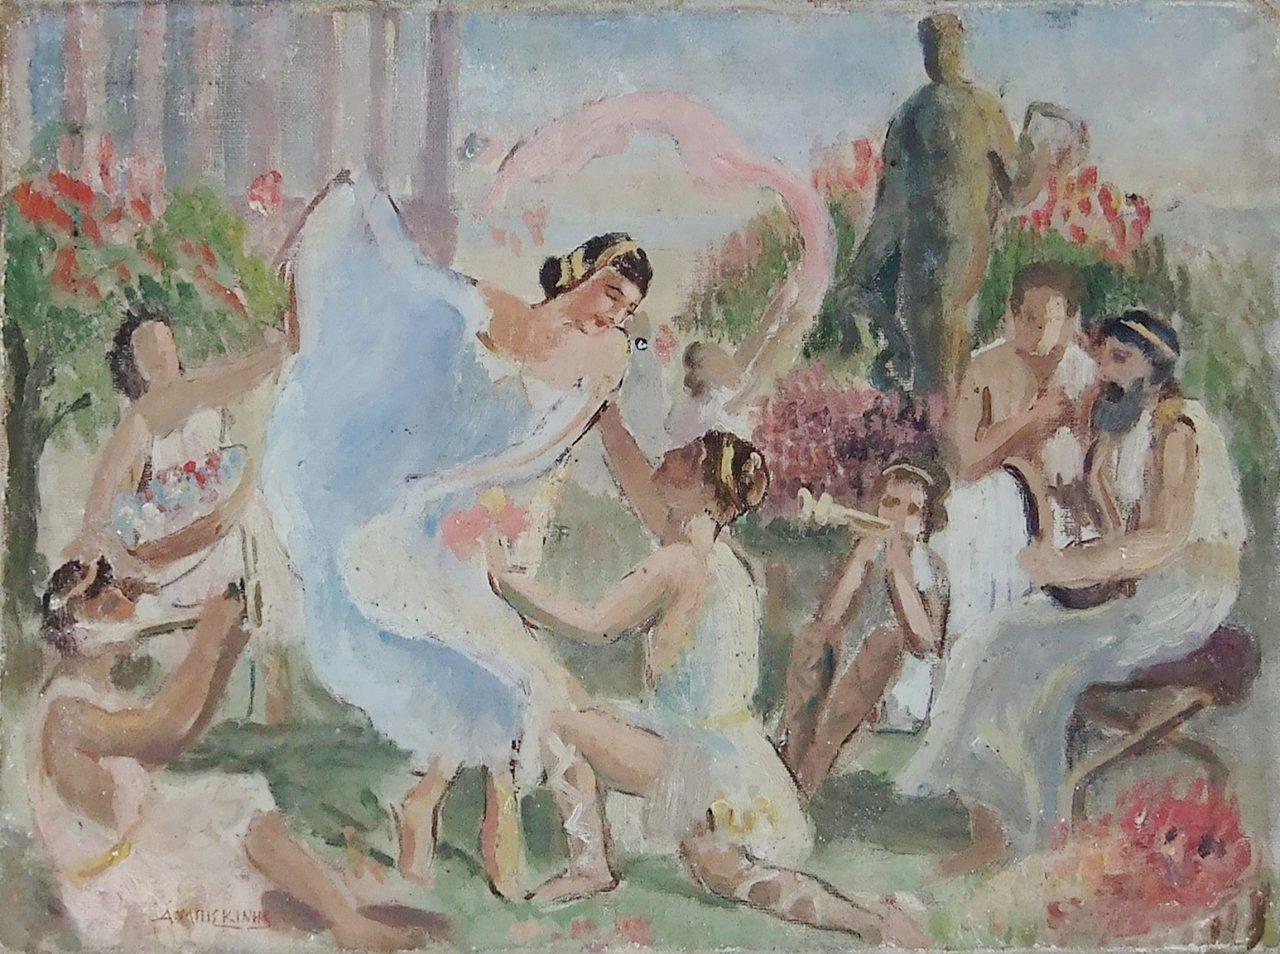 039. BISKINIS  Dimitrios (1891-1947)